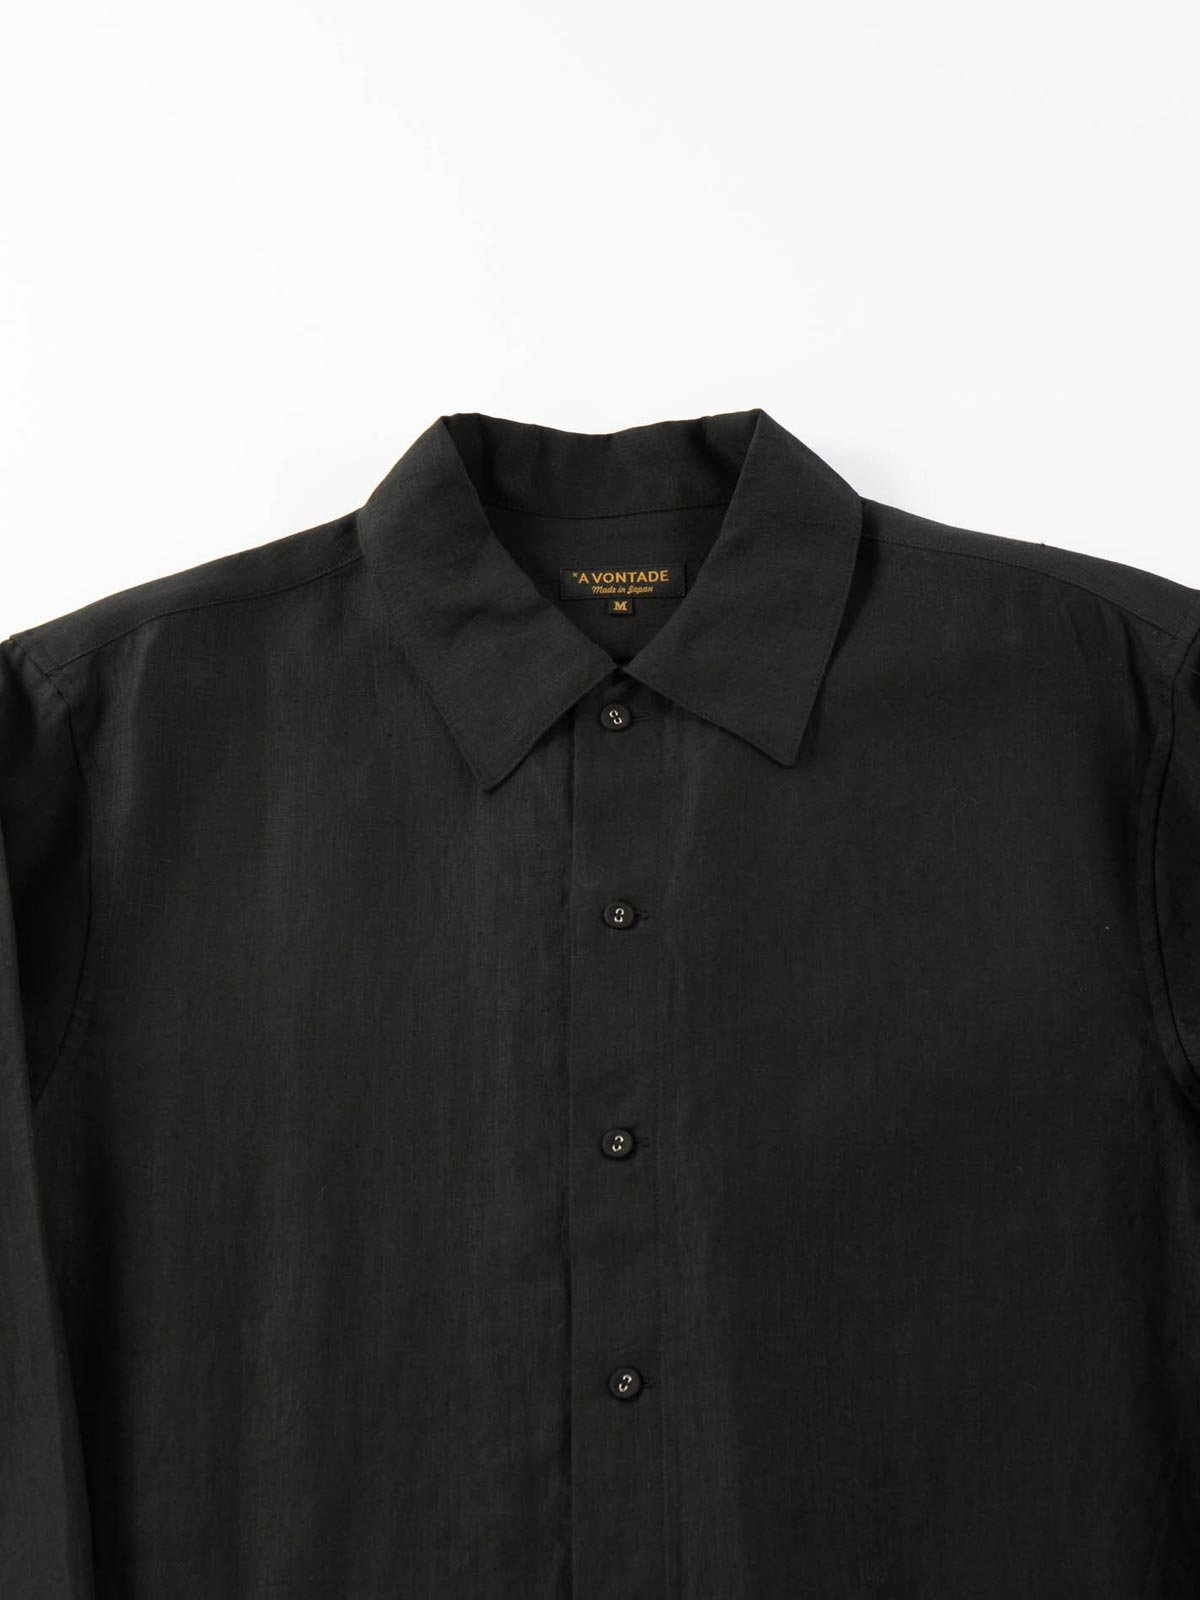 LINEN GARDNER SHIRT BLACK - Image 2